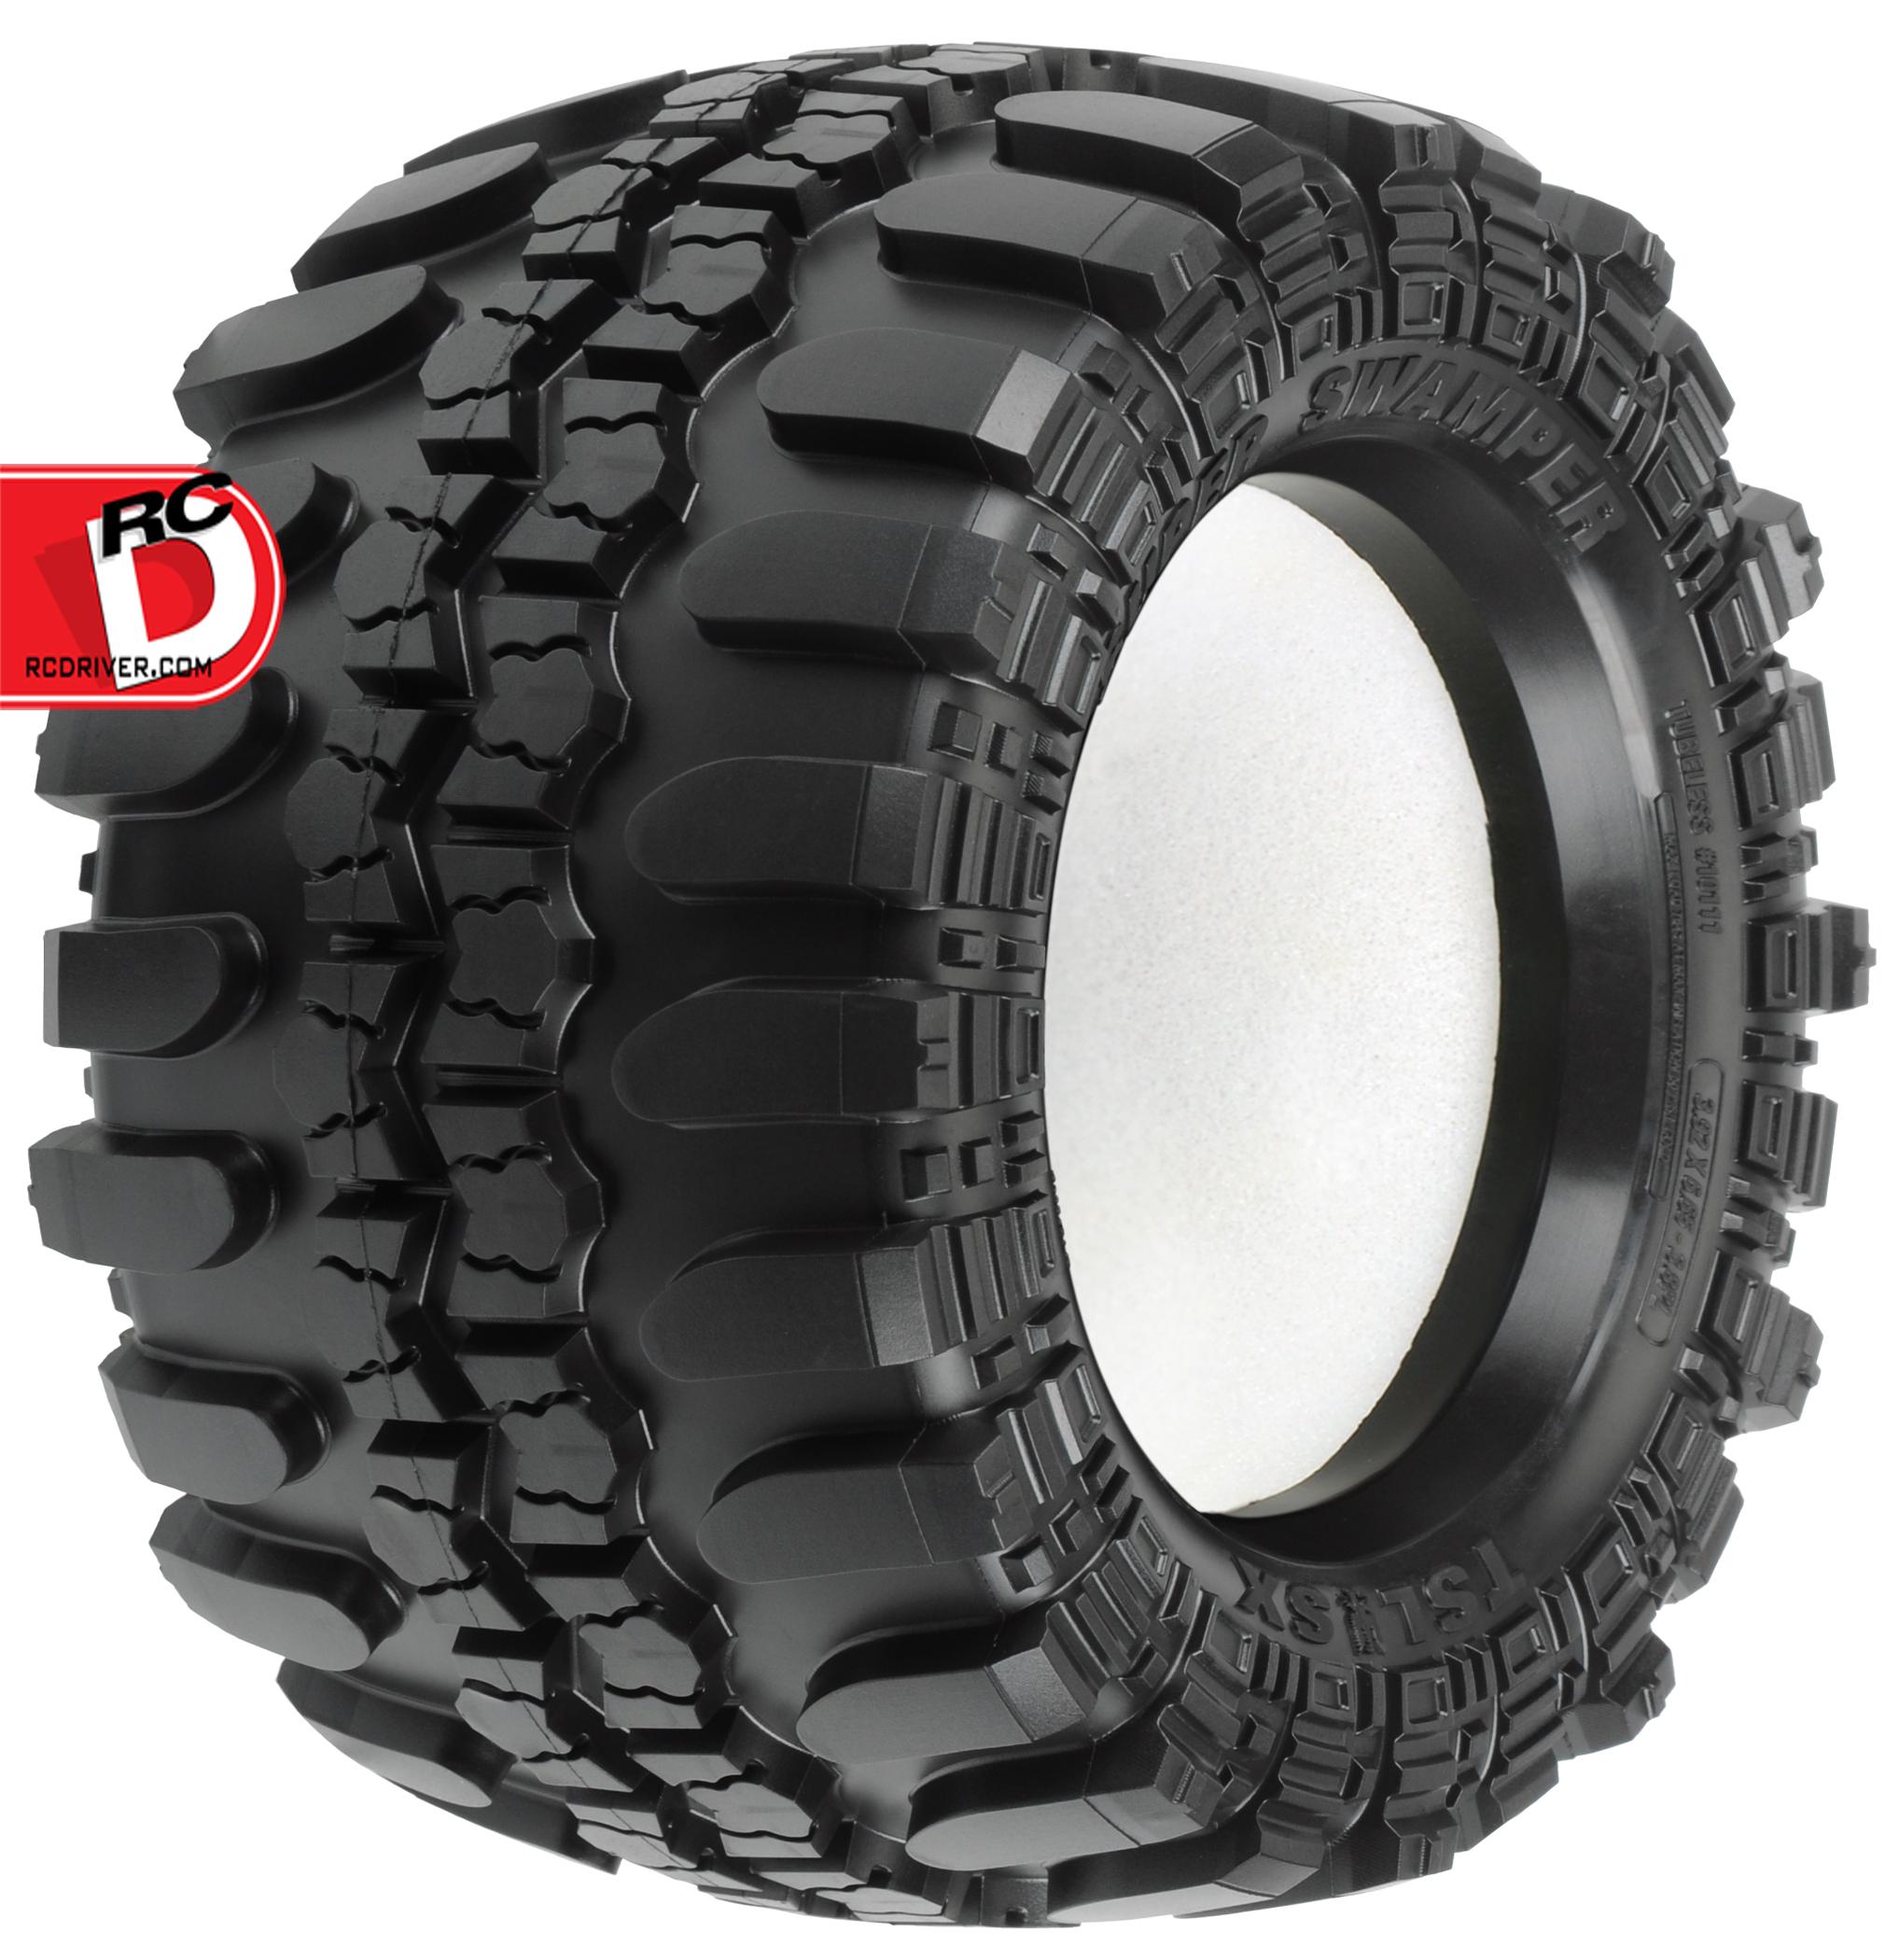 Pro-Line Interco TSL SX Super Swamper 3.8″ Tires